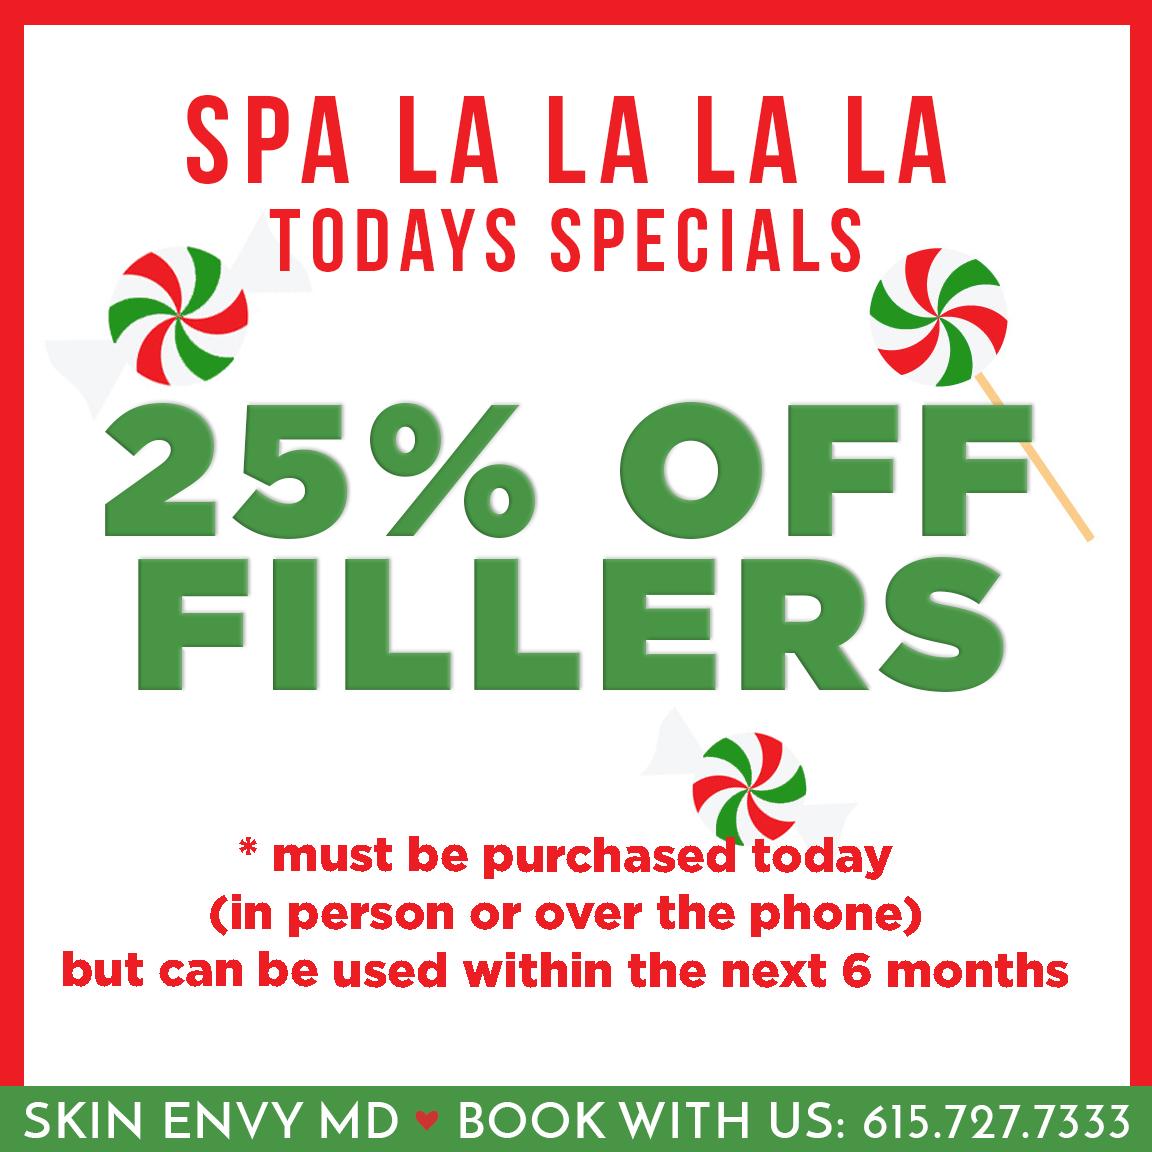 Spa la la la la - 25% off fillers - Botox Dysport Juvederm Restylane by Skin Envy MD Nashville.png